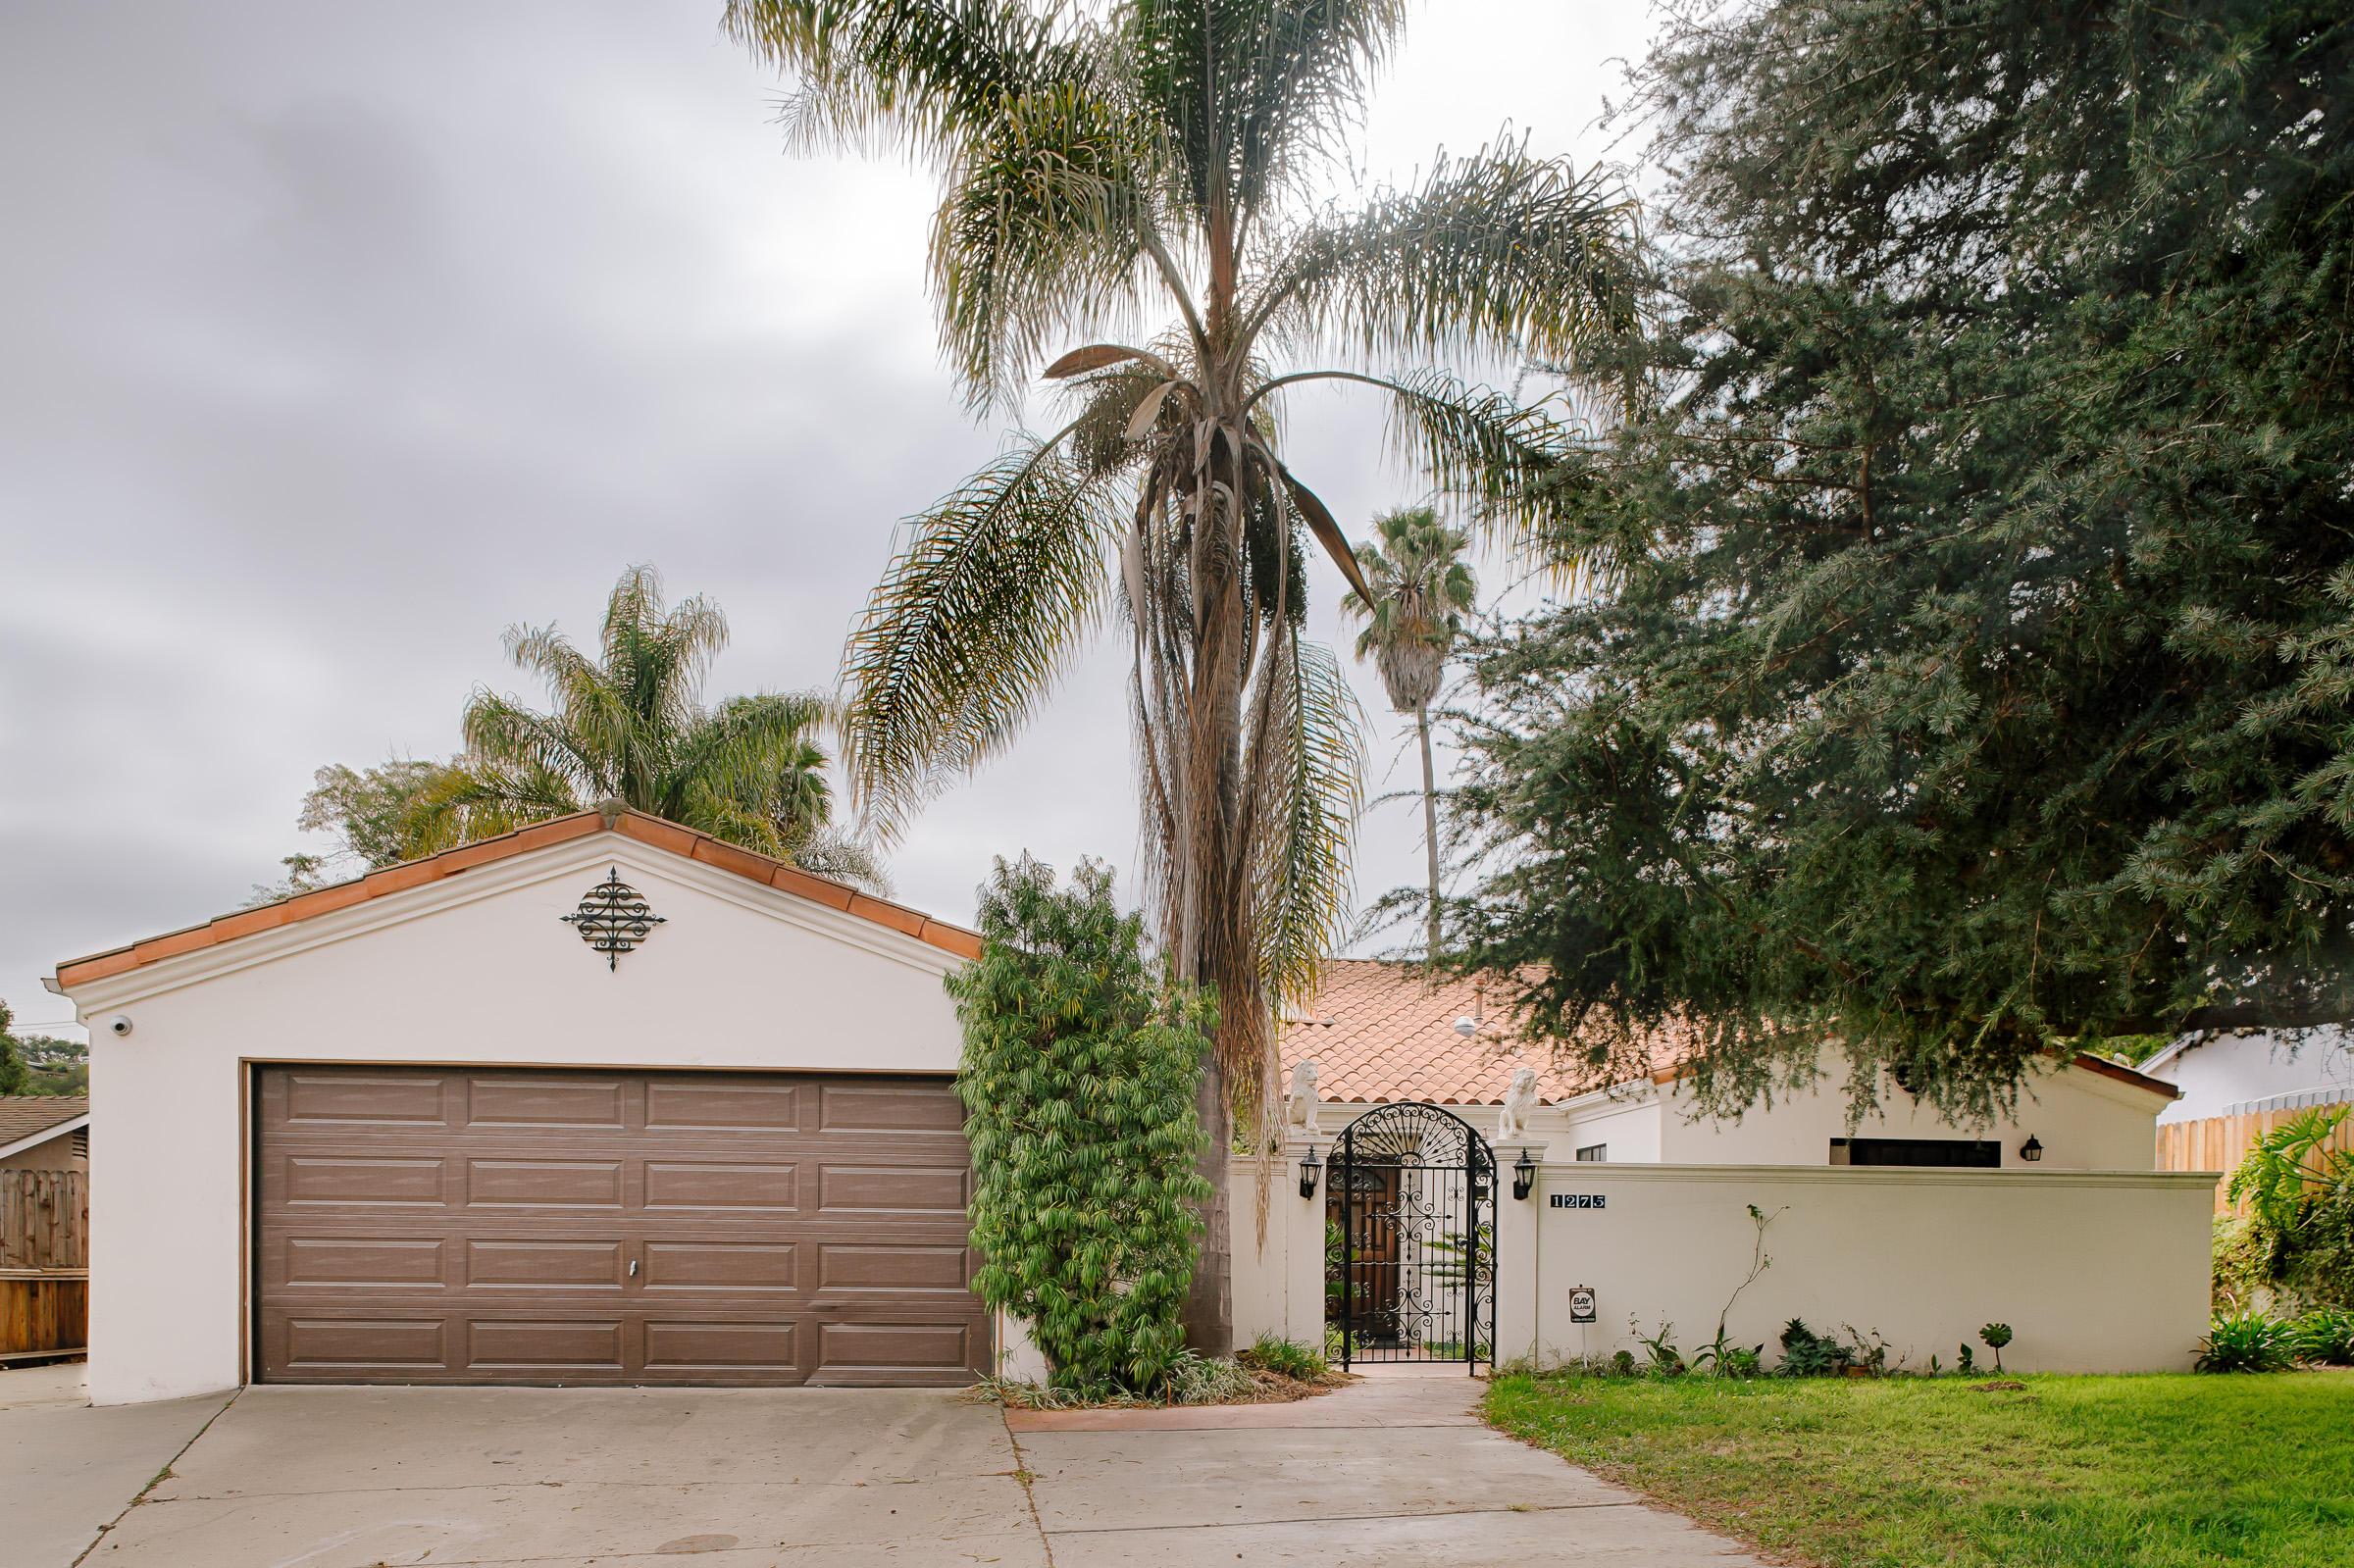 Property photo for 1275 Mountain View Rd Santa Barbara, California 93109 - 18-4054